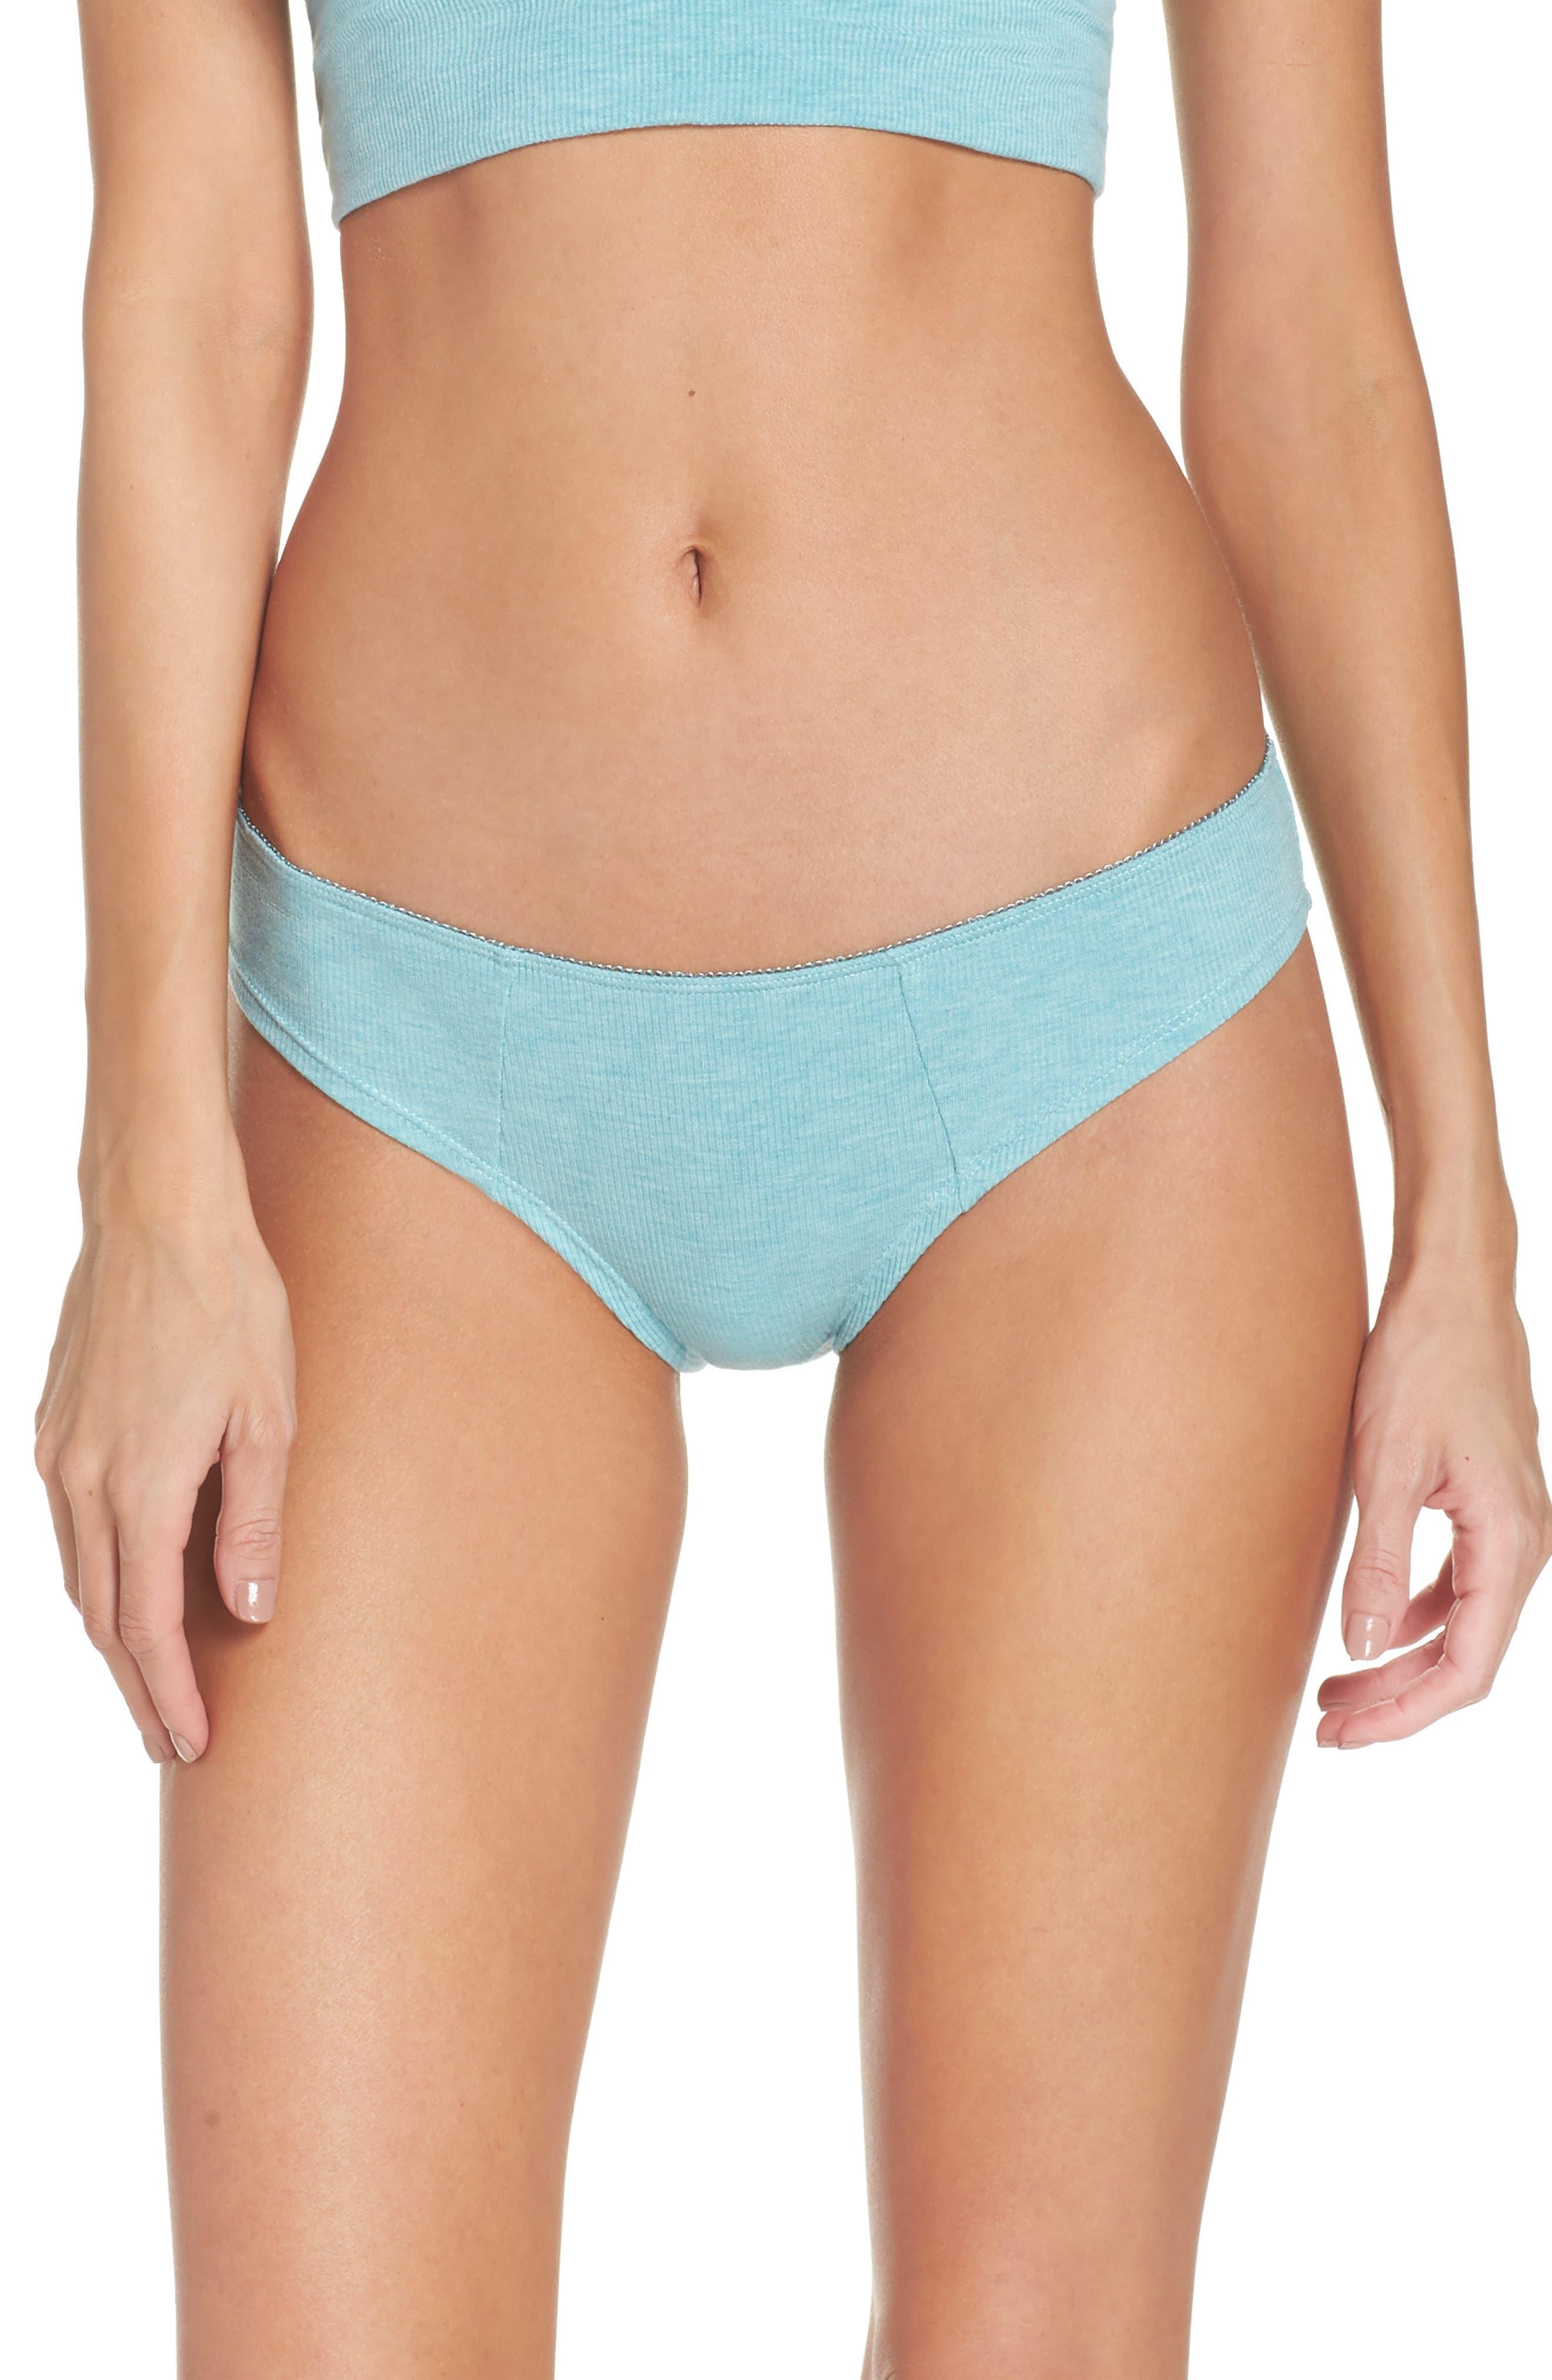 Rib Knit Bikini,                         Main,                         color, Prickly Pear